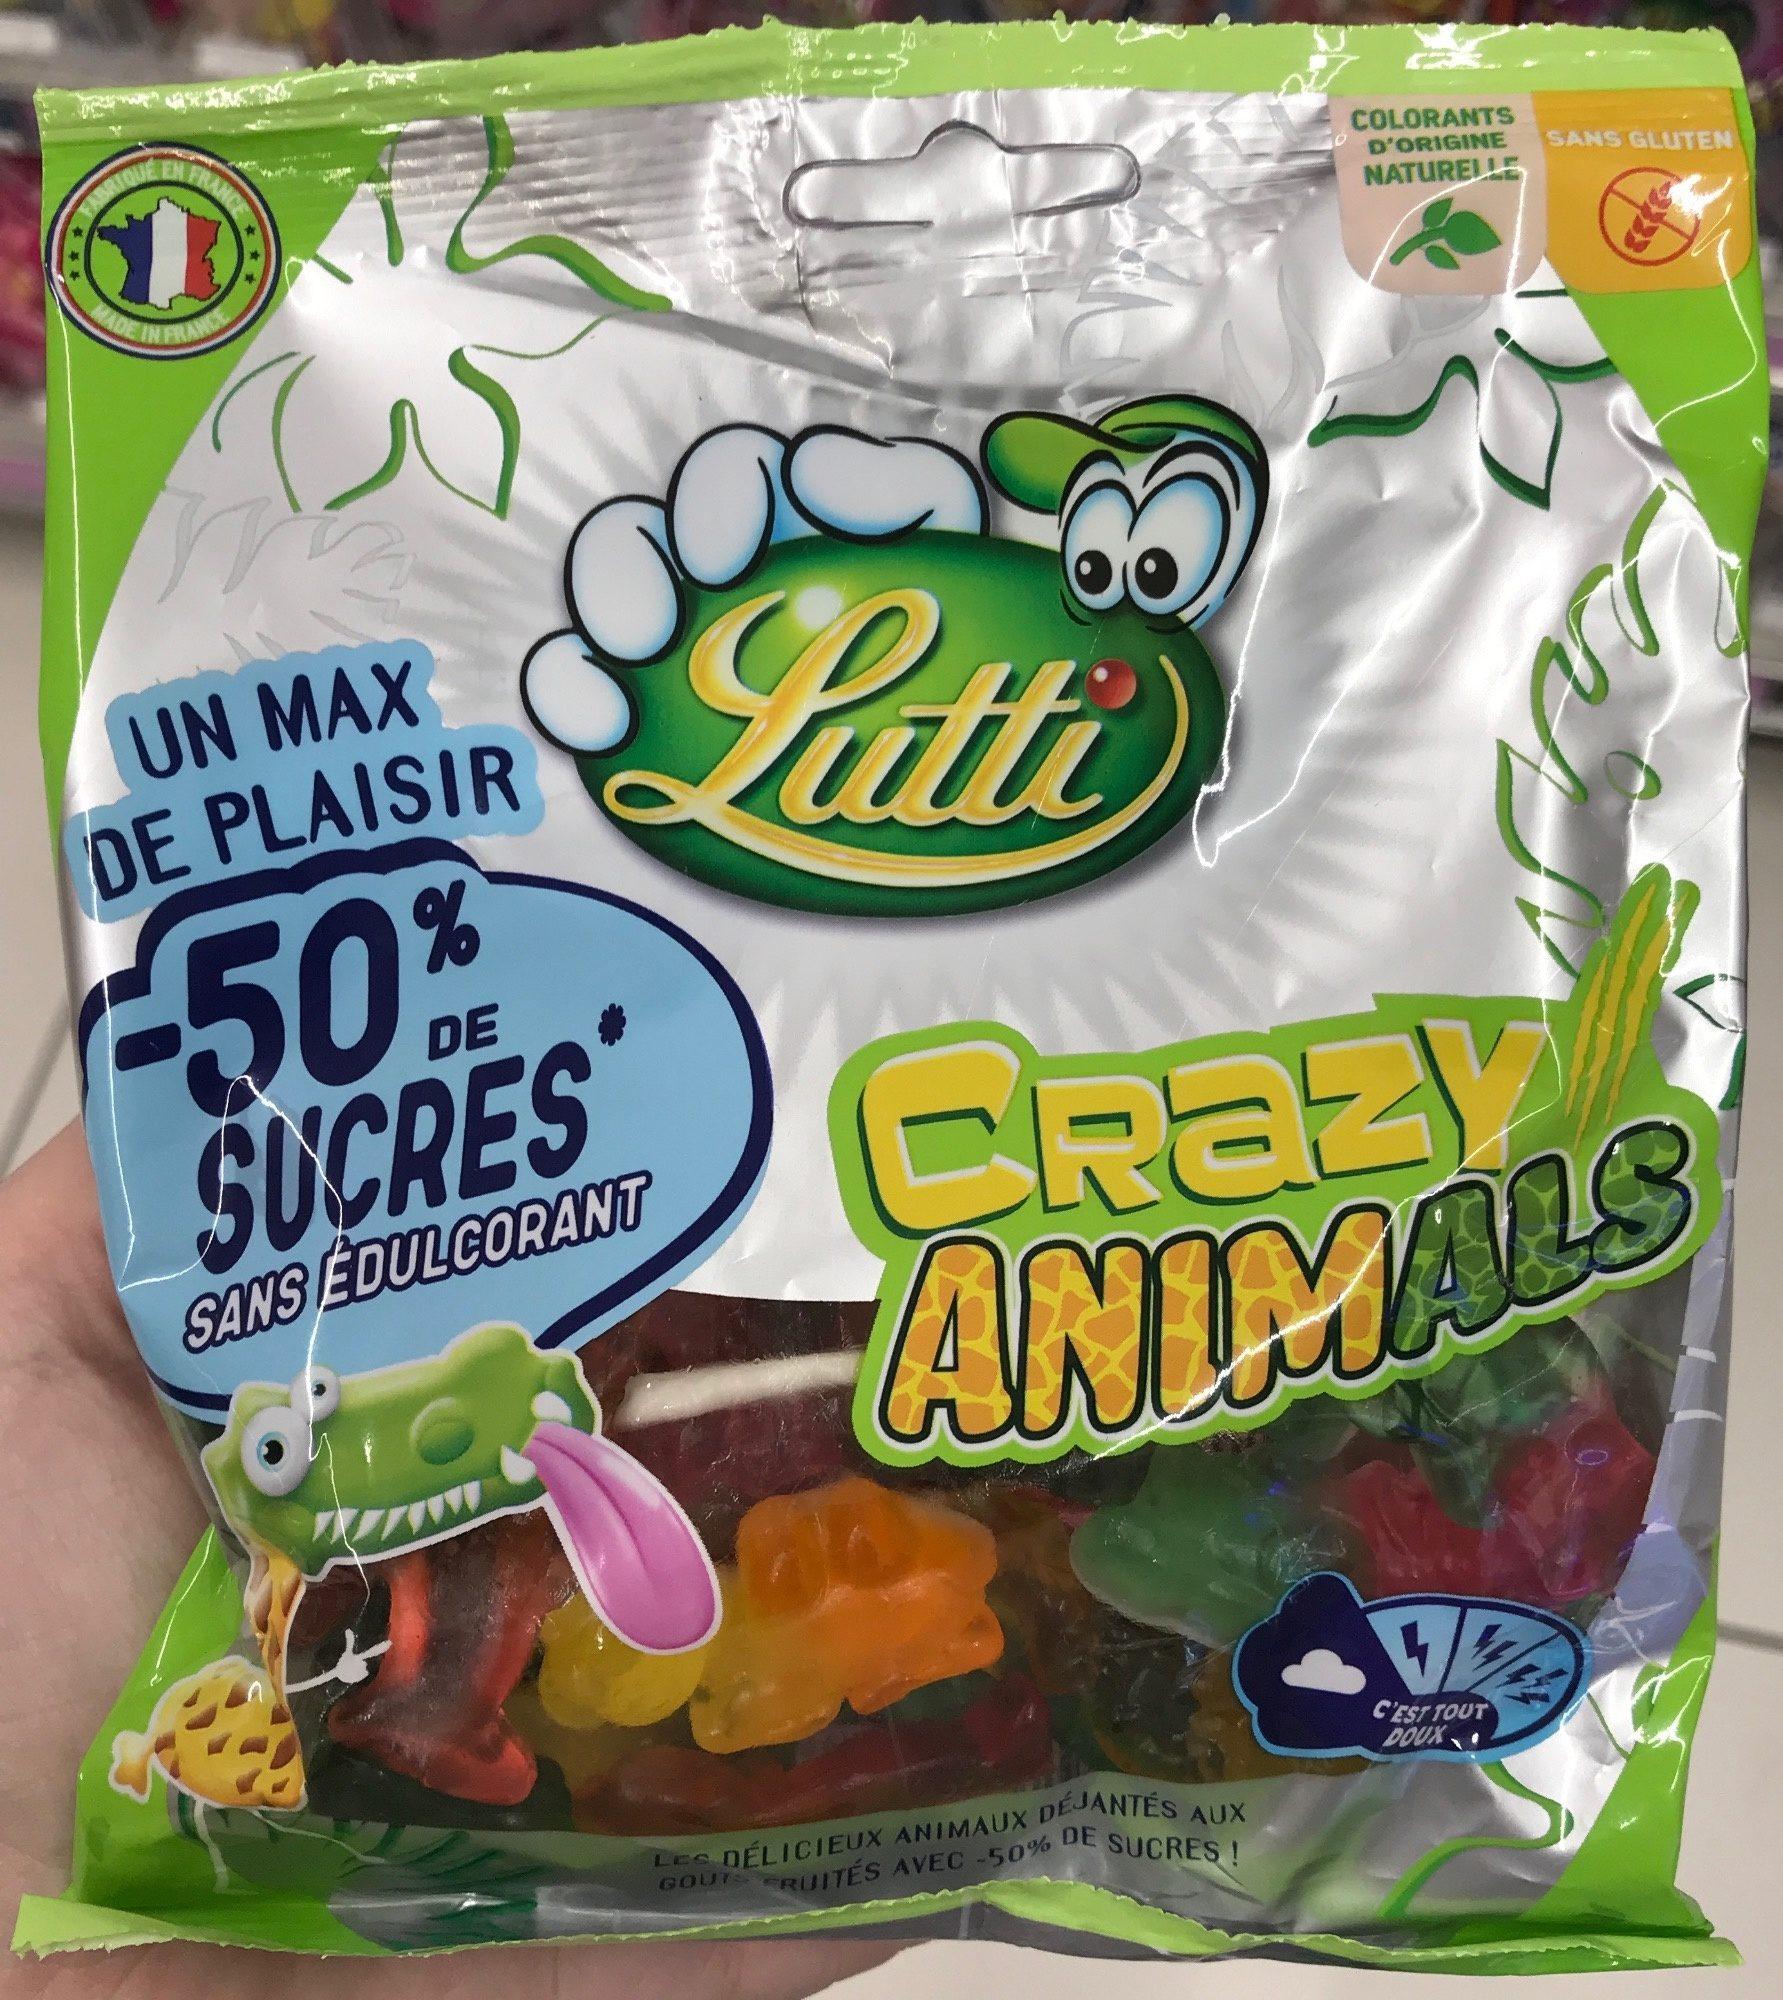 Crazy animals (-50 % de sucres) - Product